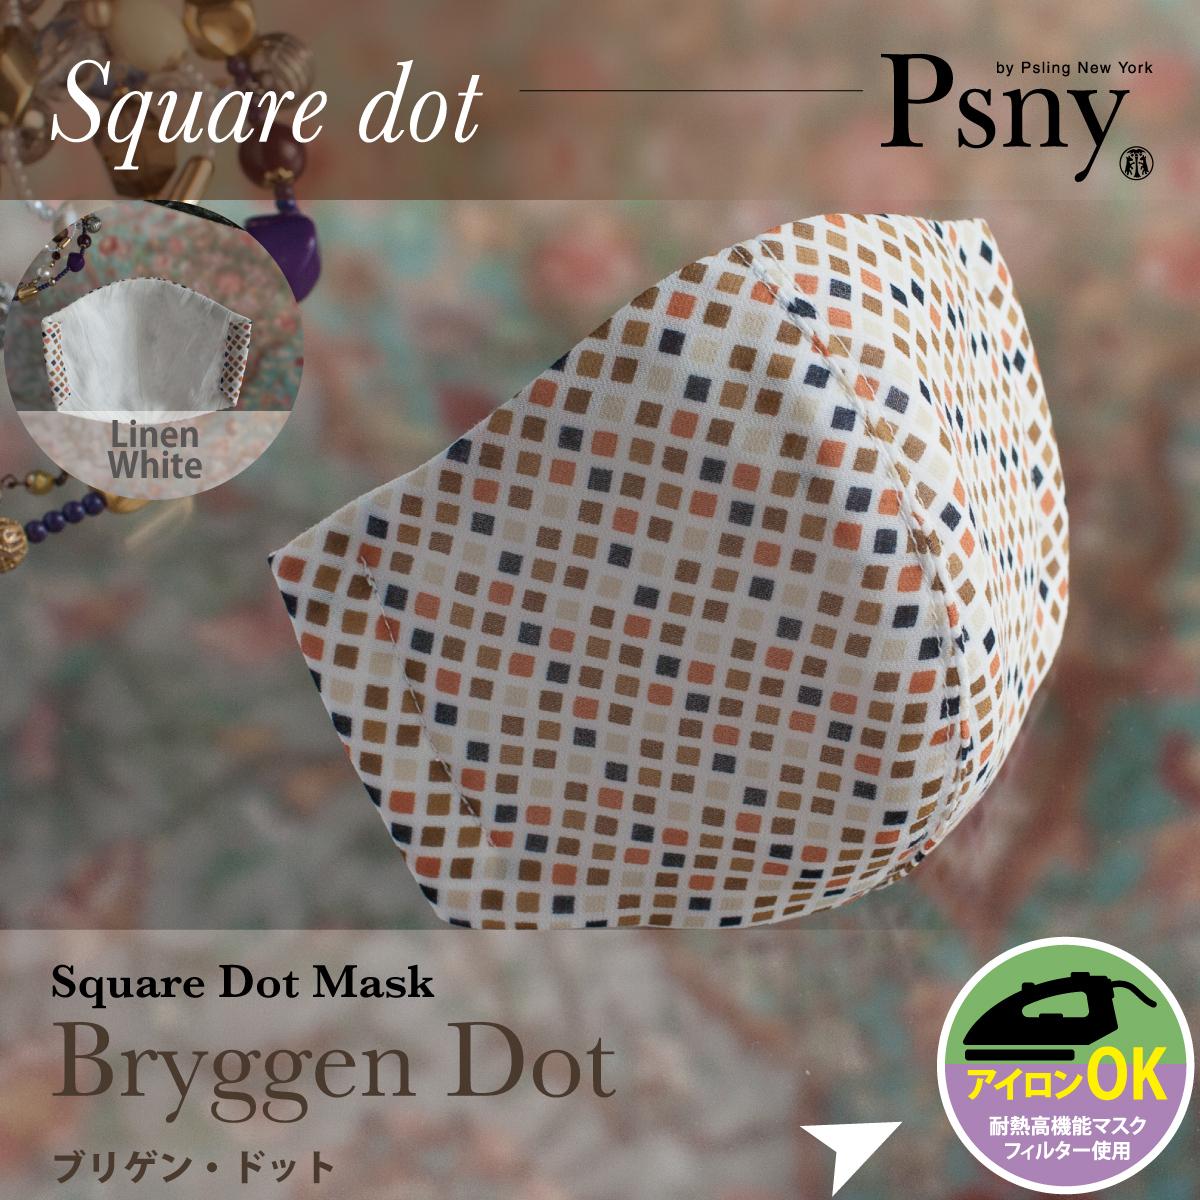 PSNY ブリッゲン・ドット 花粉 黄砂 洗える不織布フィルター入り 立体 大人用 マスク 送料無料 C06